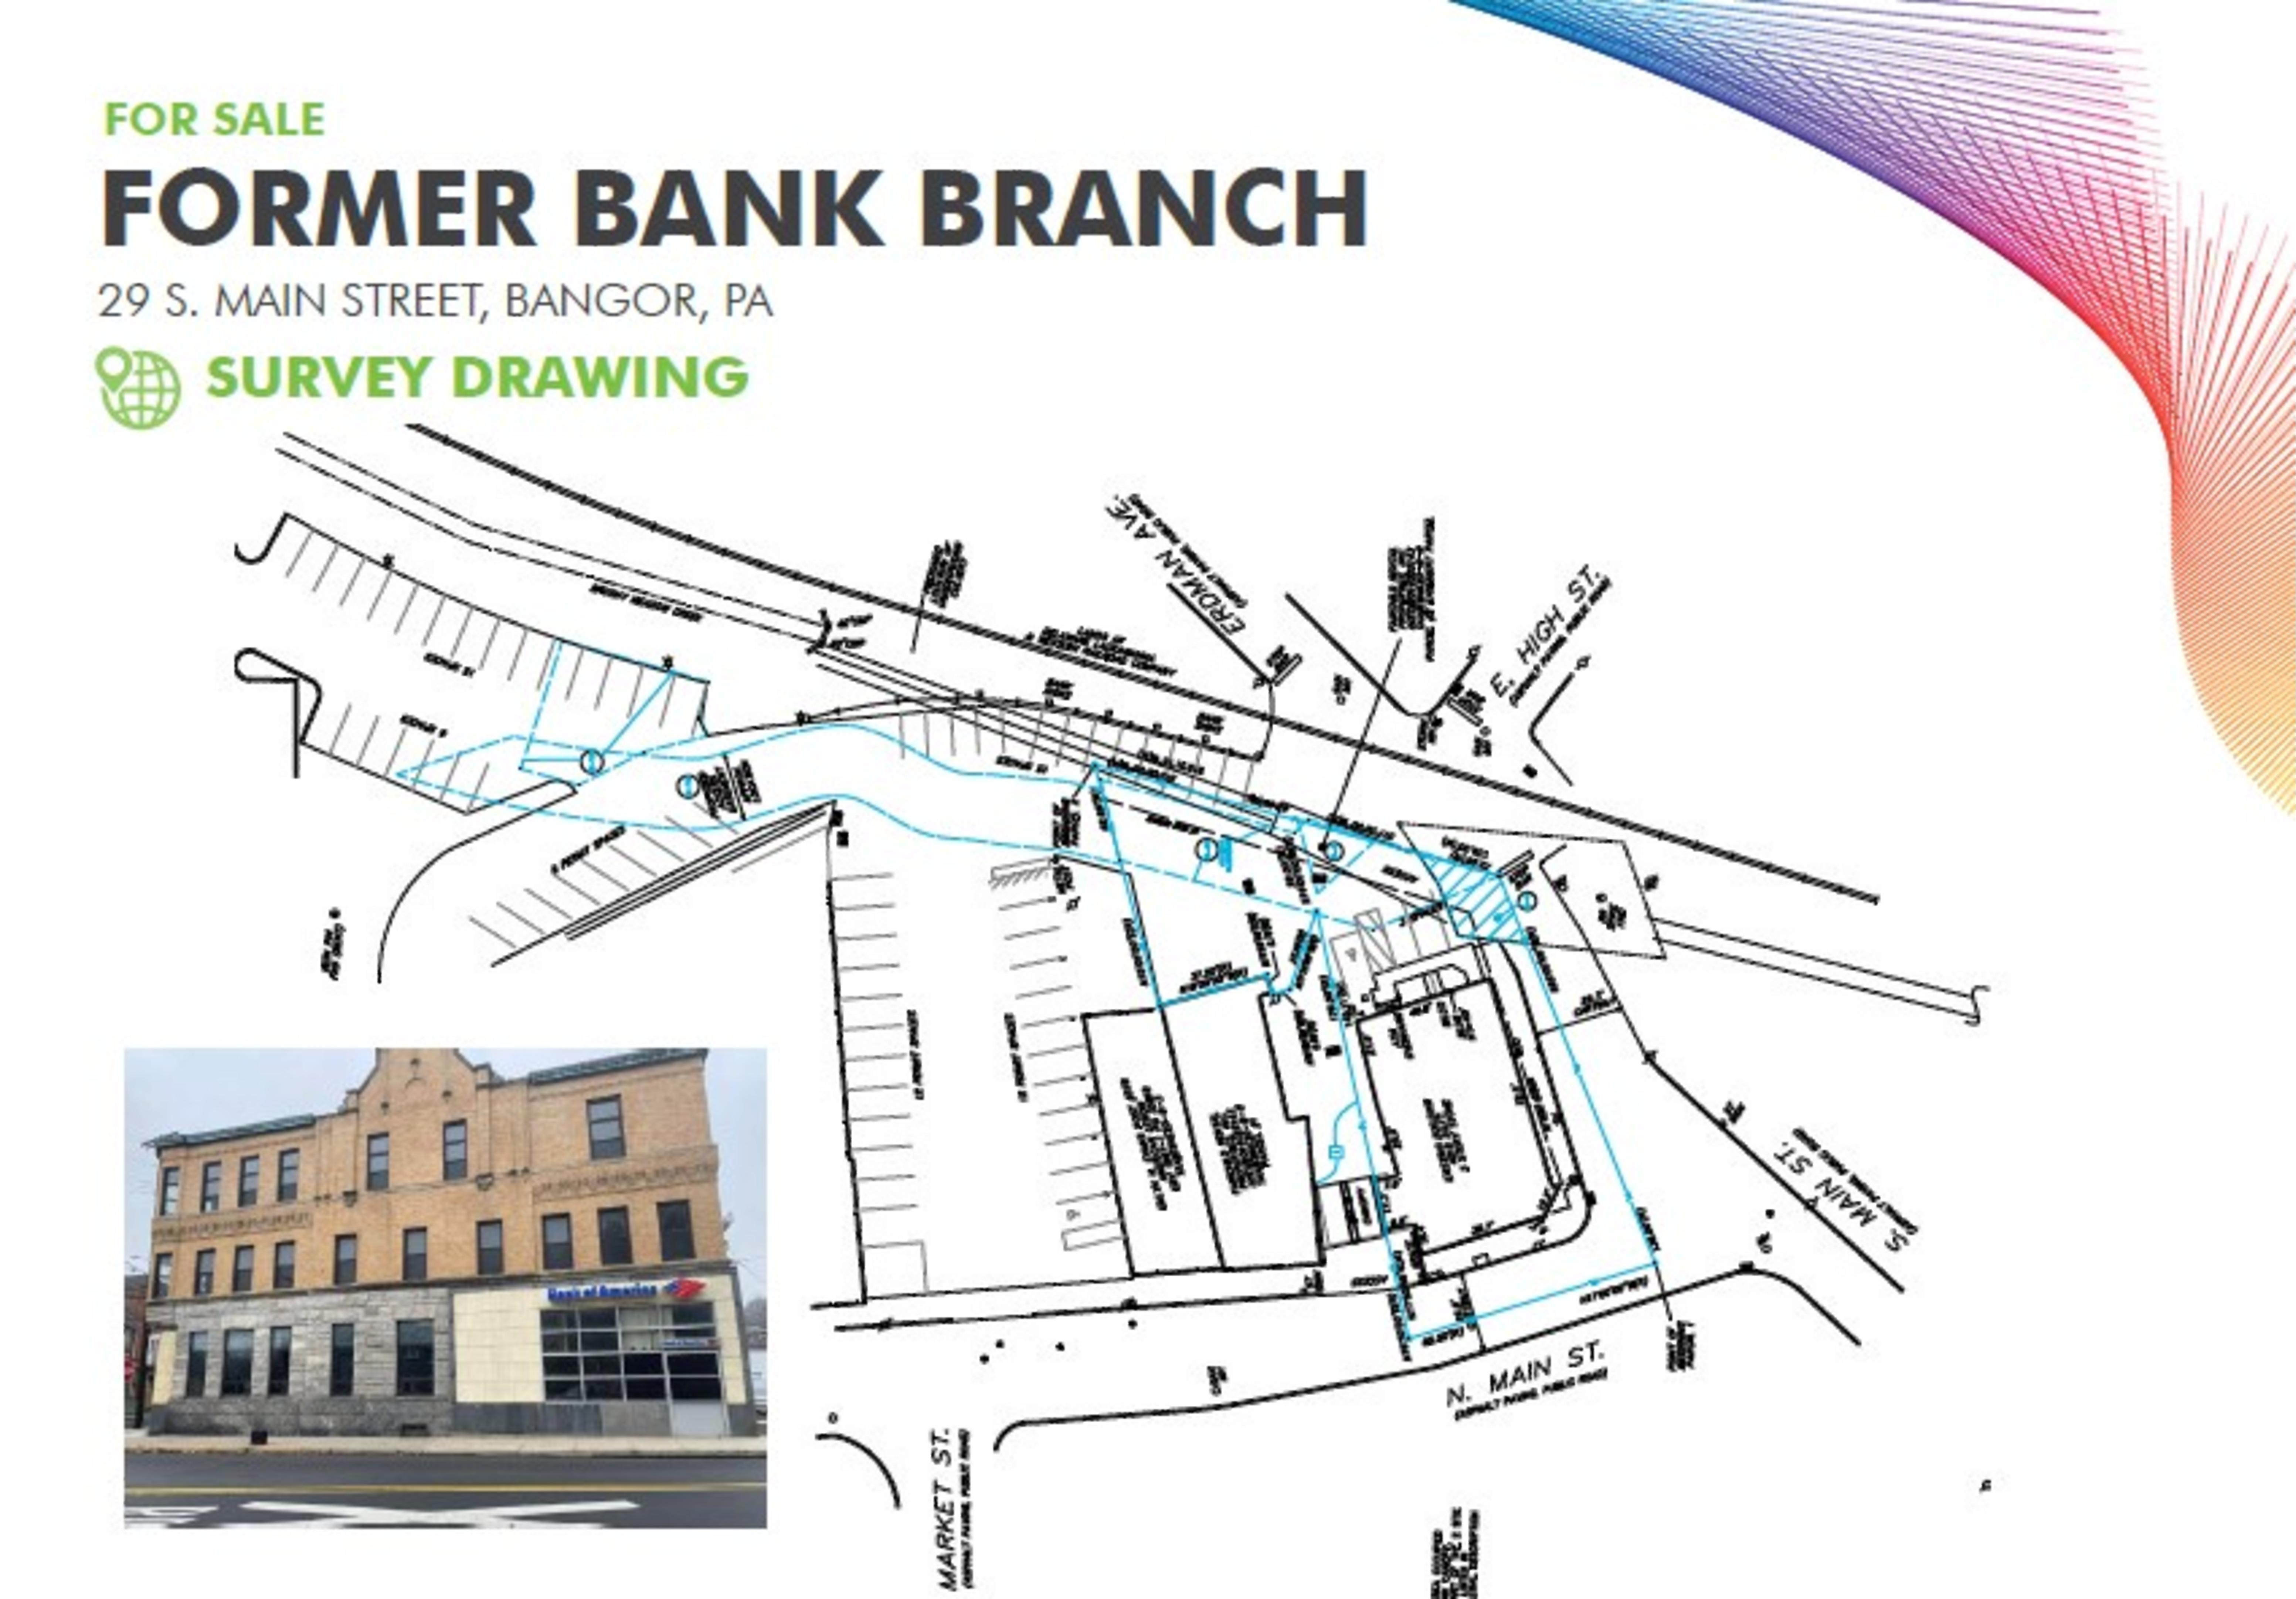 Former Bank Branch - Bangor, PA: site plan